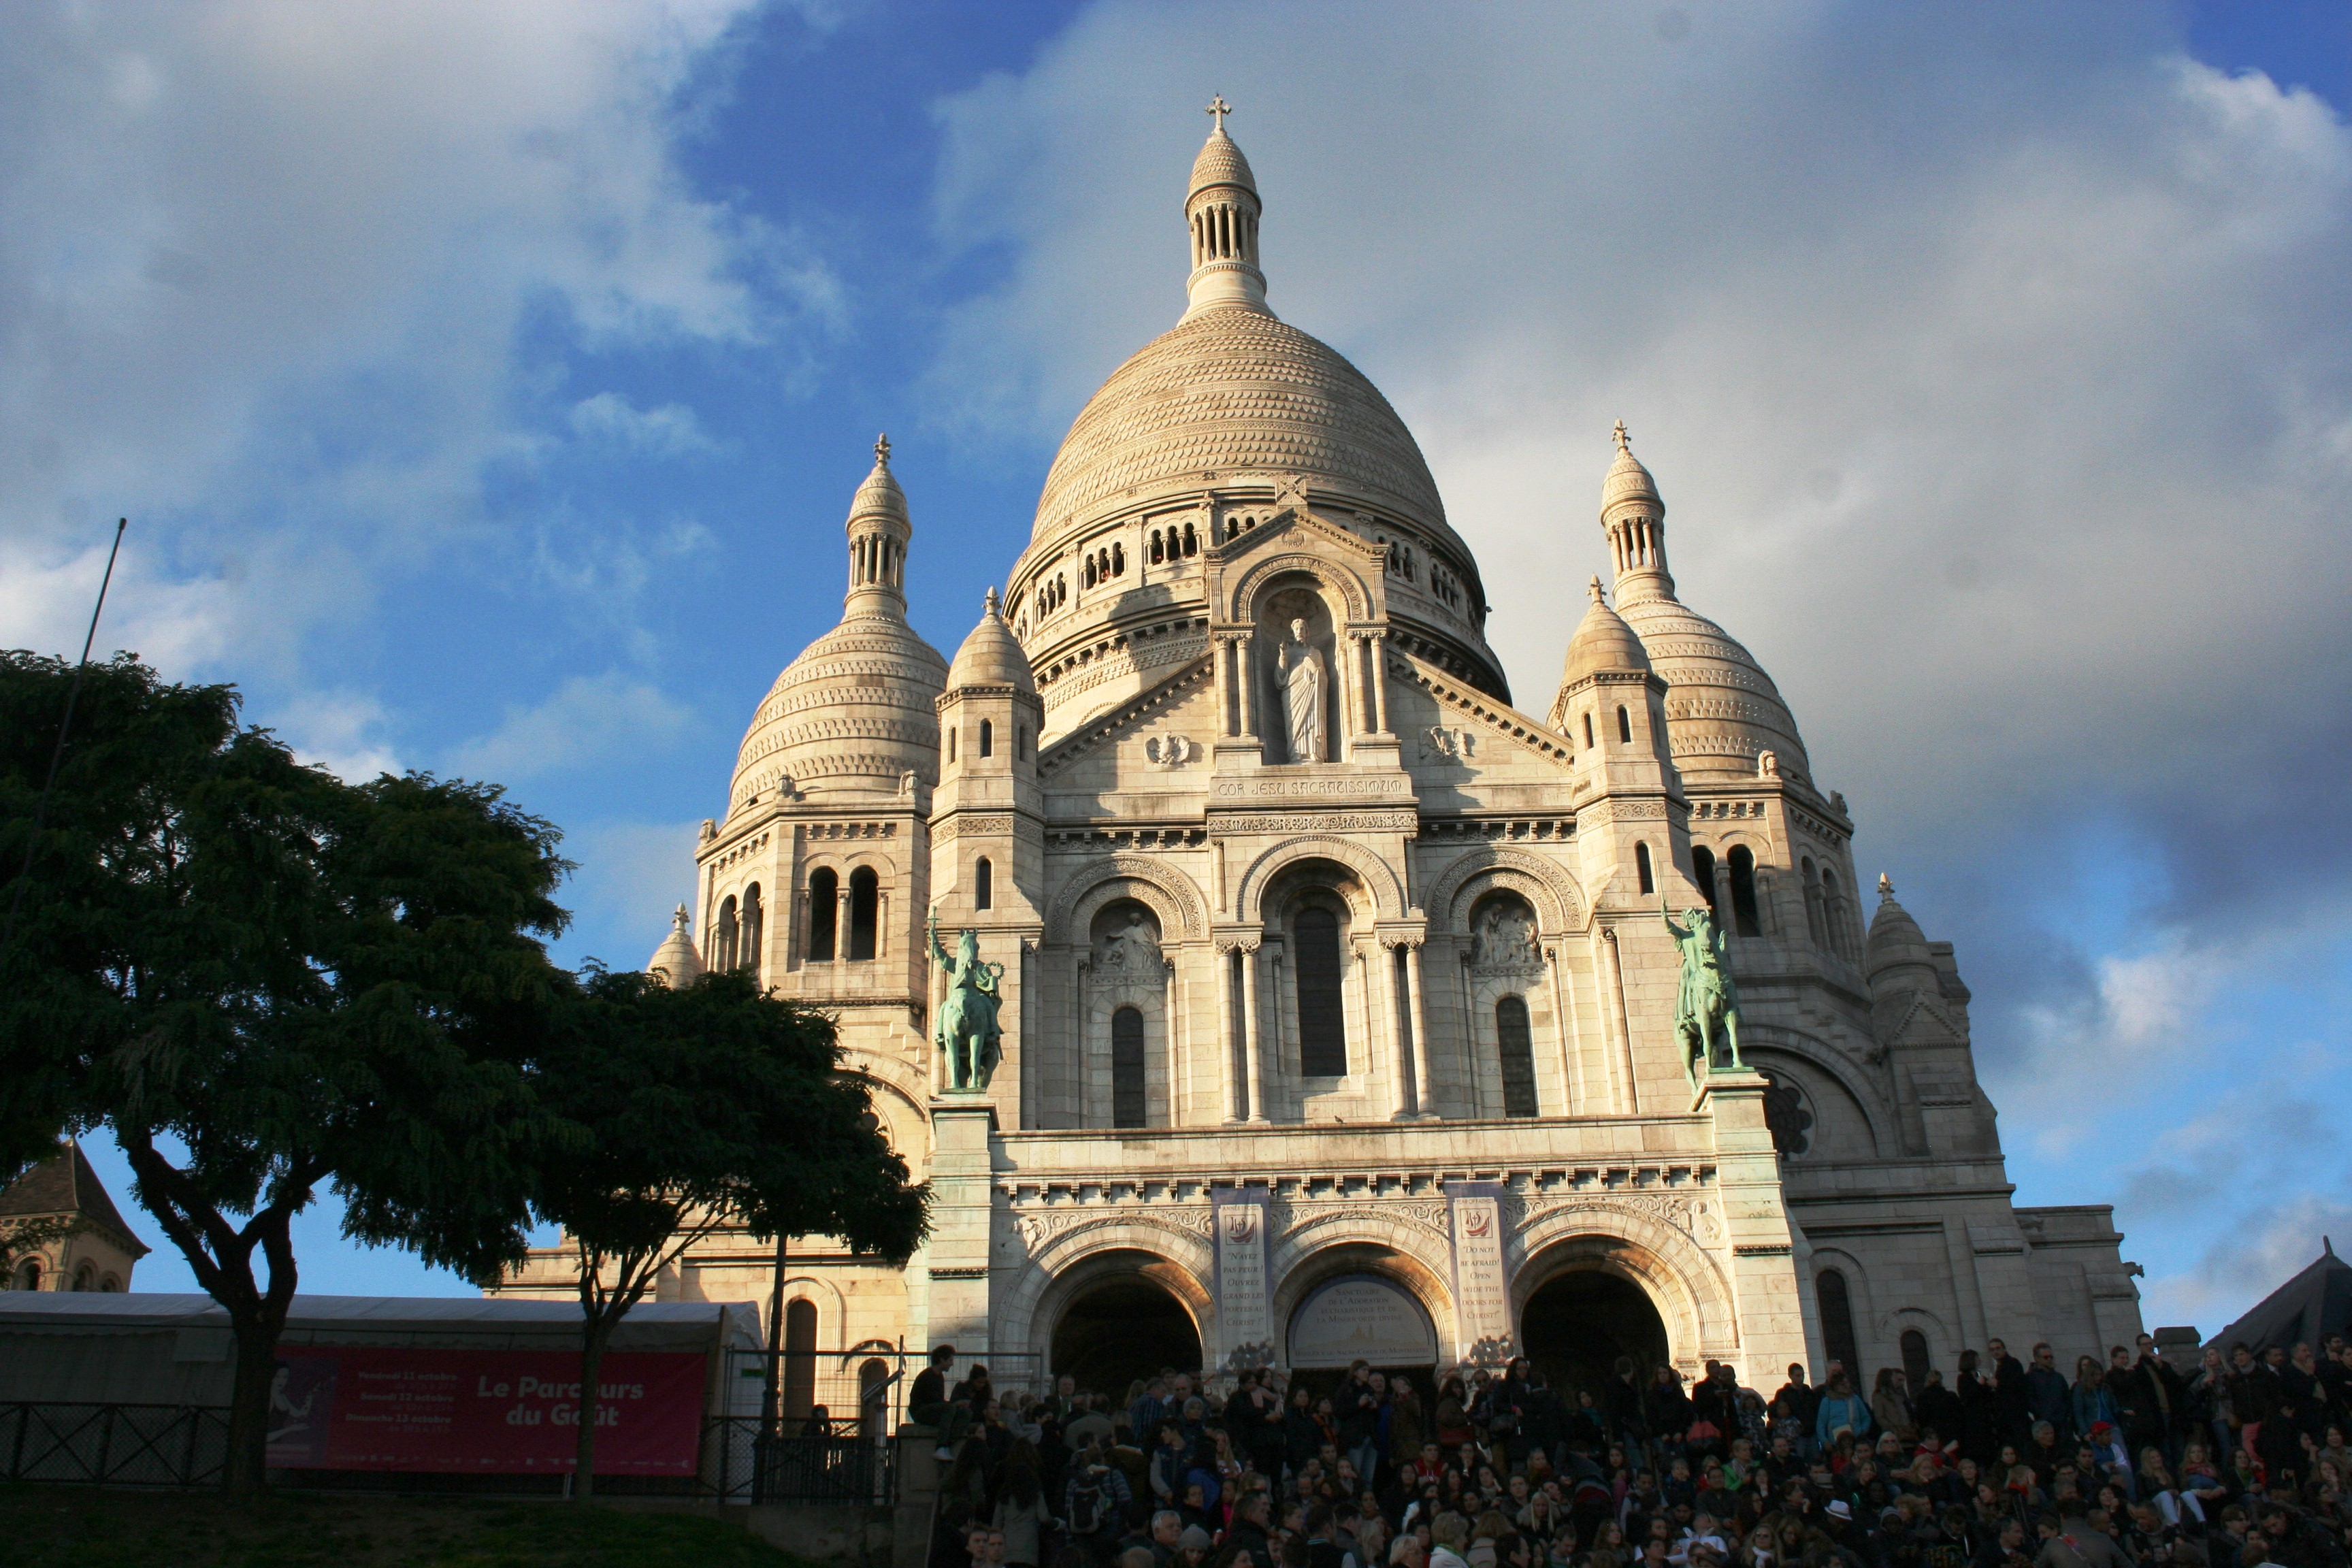 Basilica of Sacre Coeur, Paris